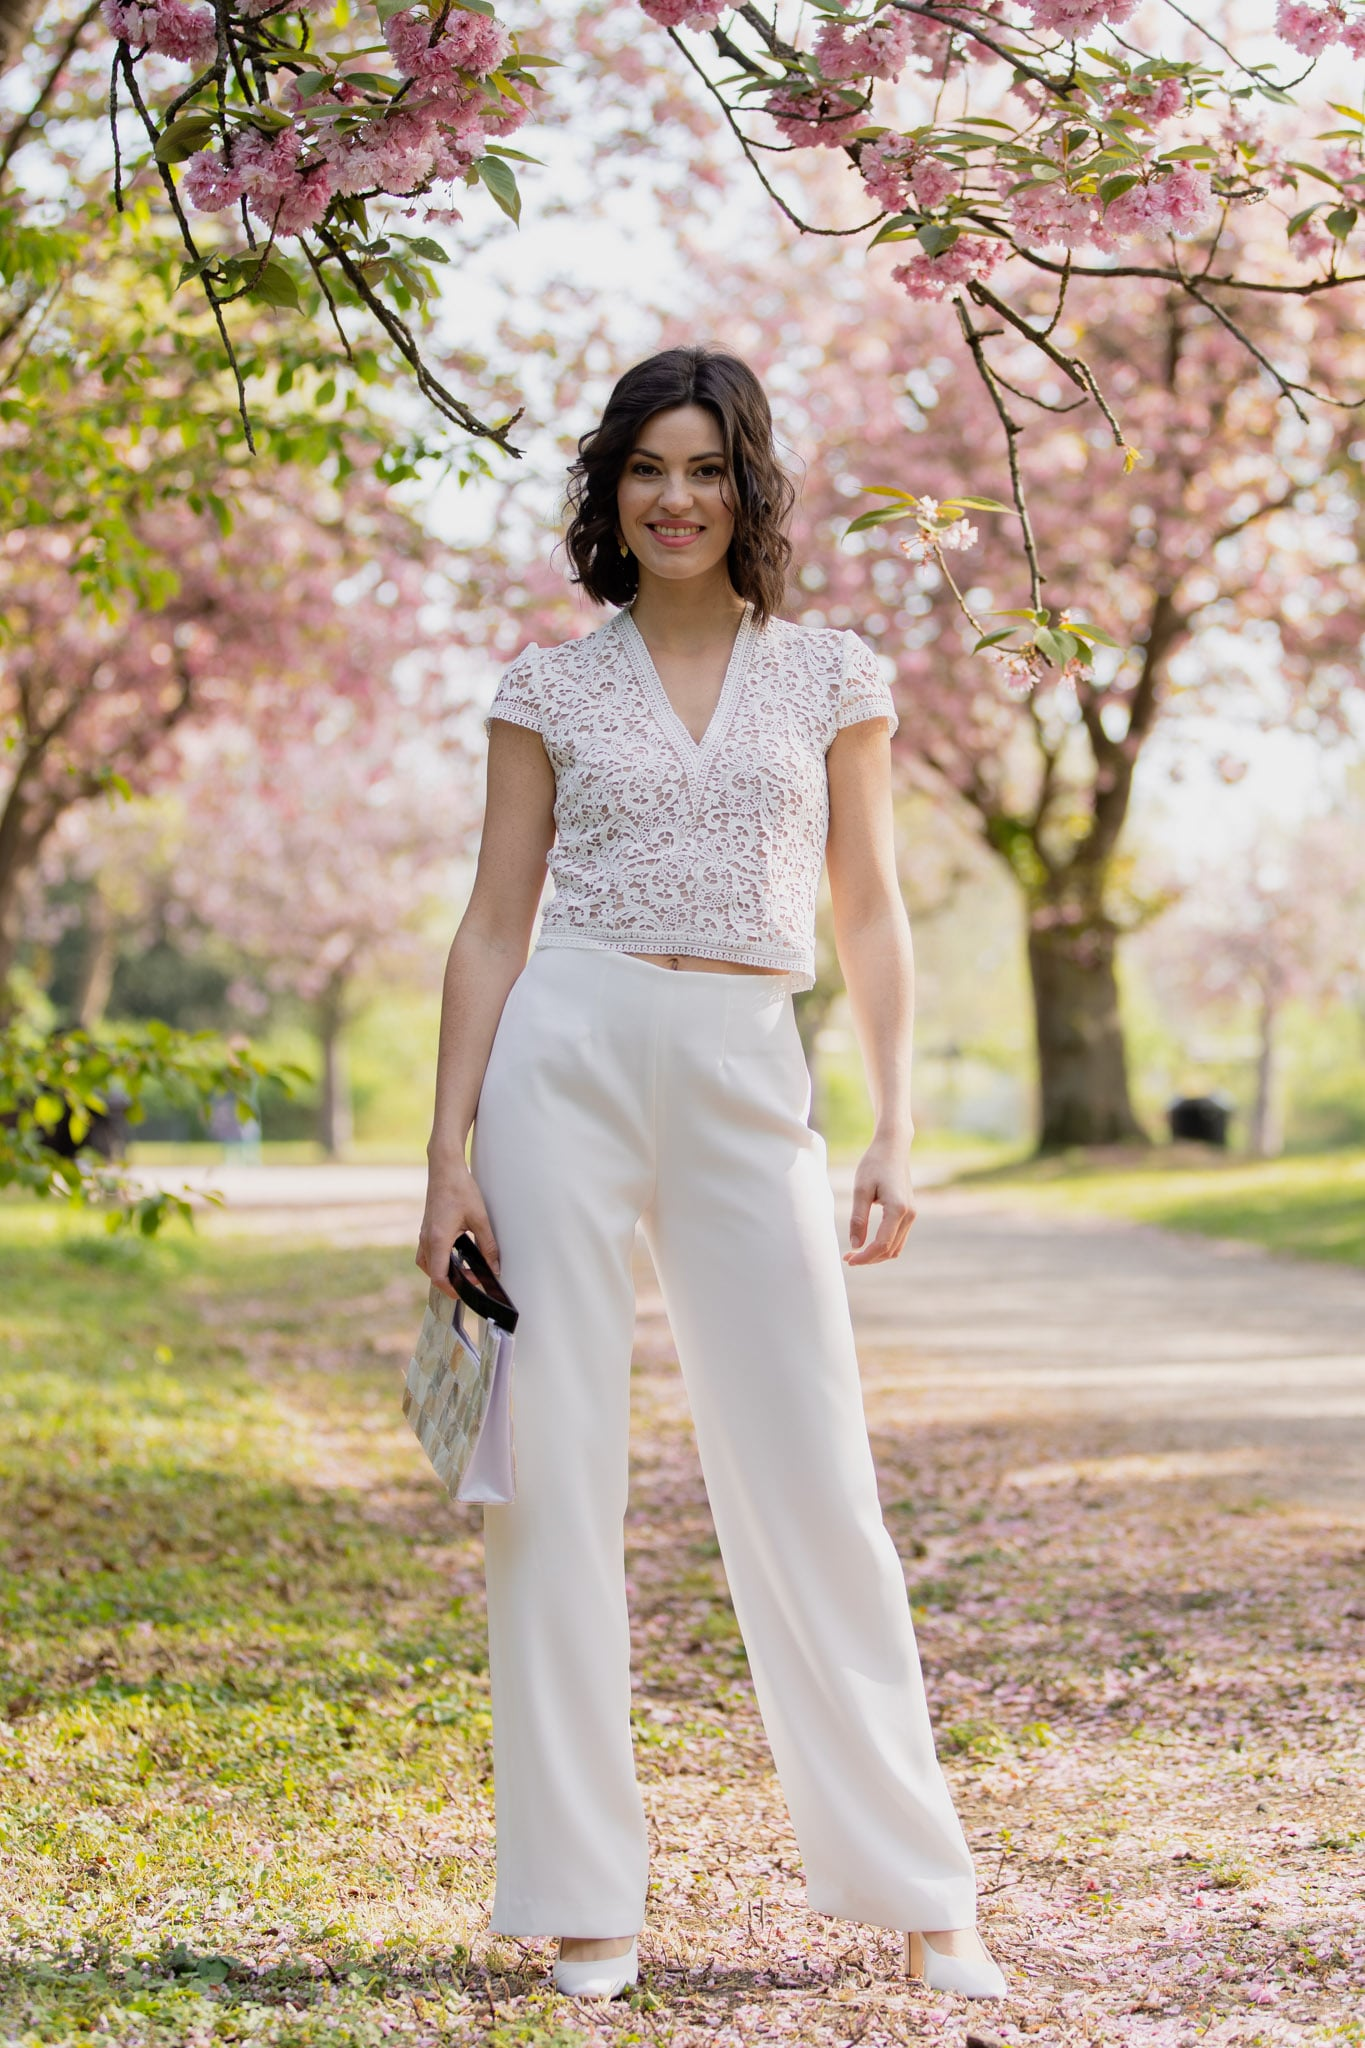 Linnea Claudia Heller Modedesign Brautkombination – gesehen bei frauimmer-herrewig.de